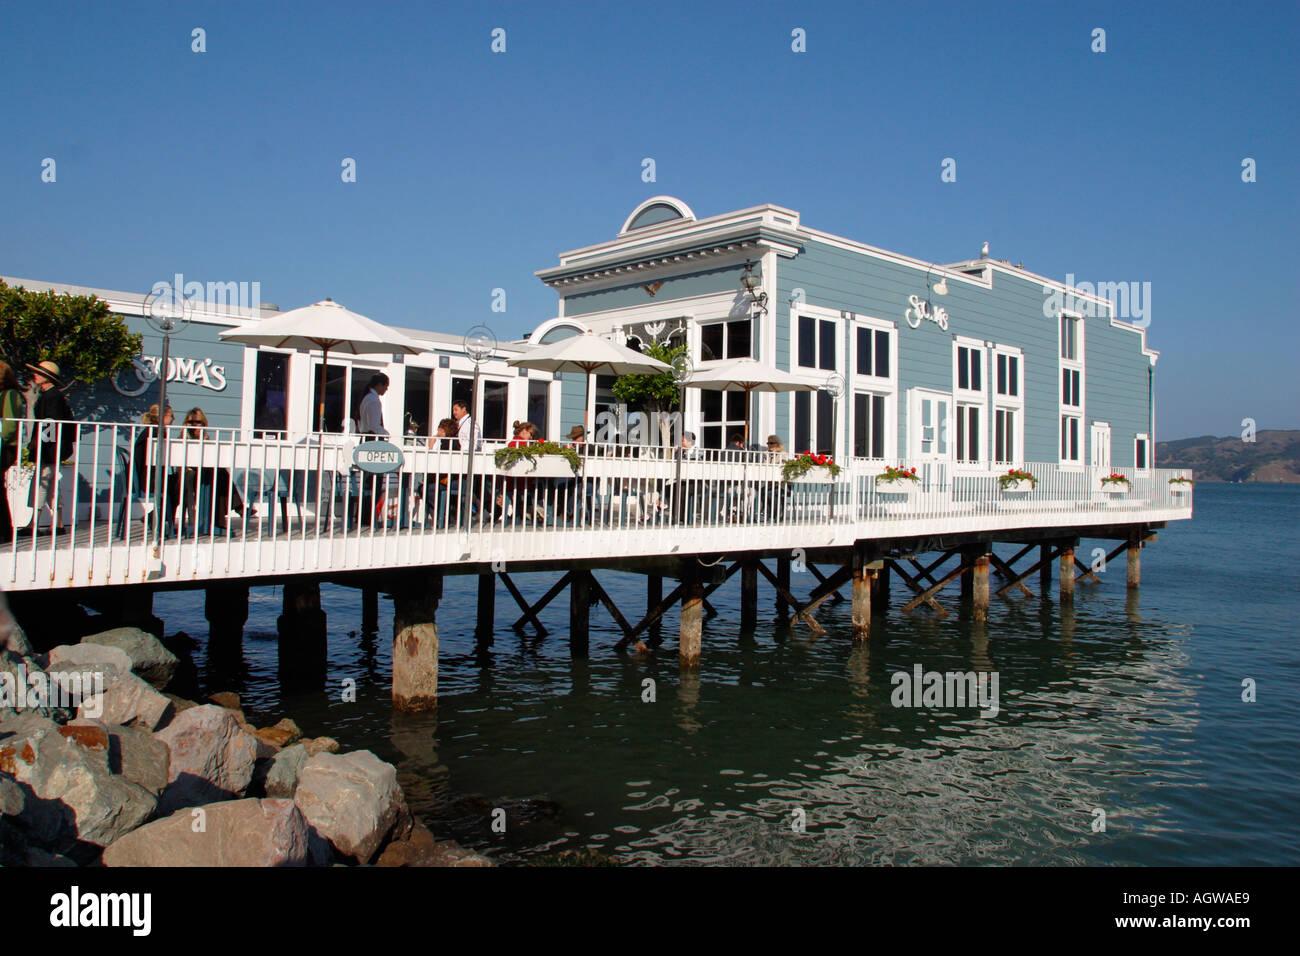 Waterfront Restaurant Sausalito California Stock Photo 2661096 Alamy